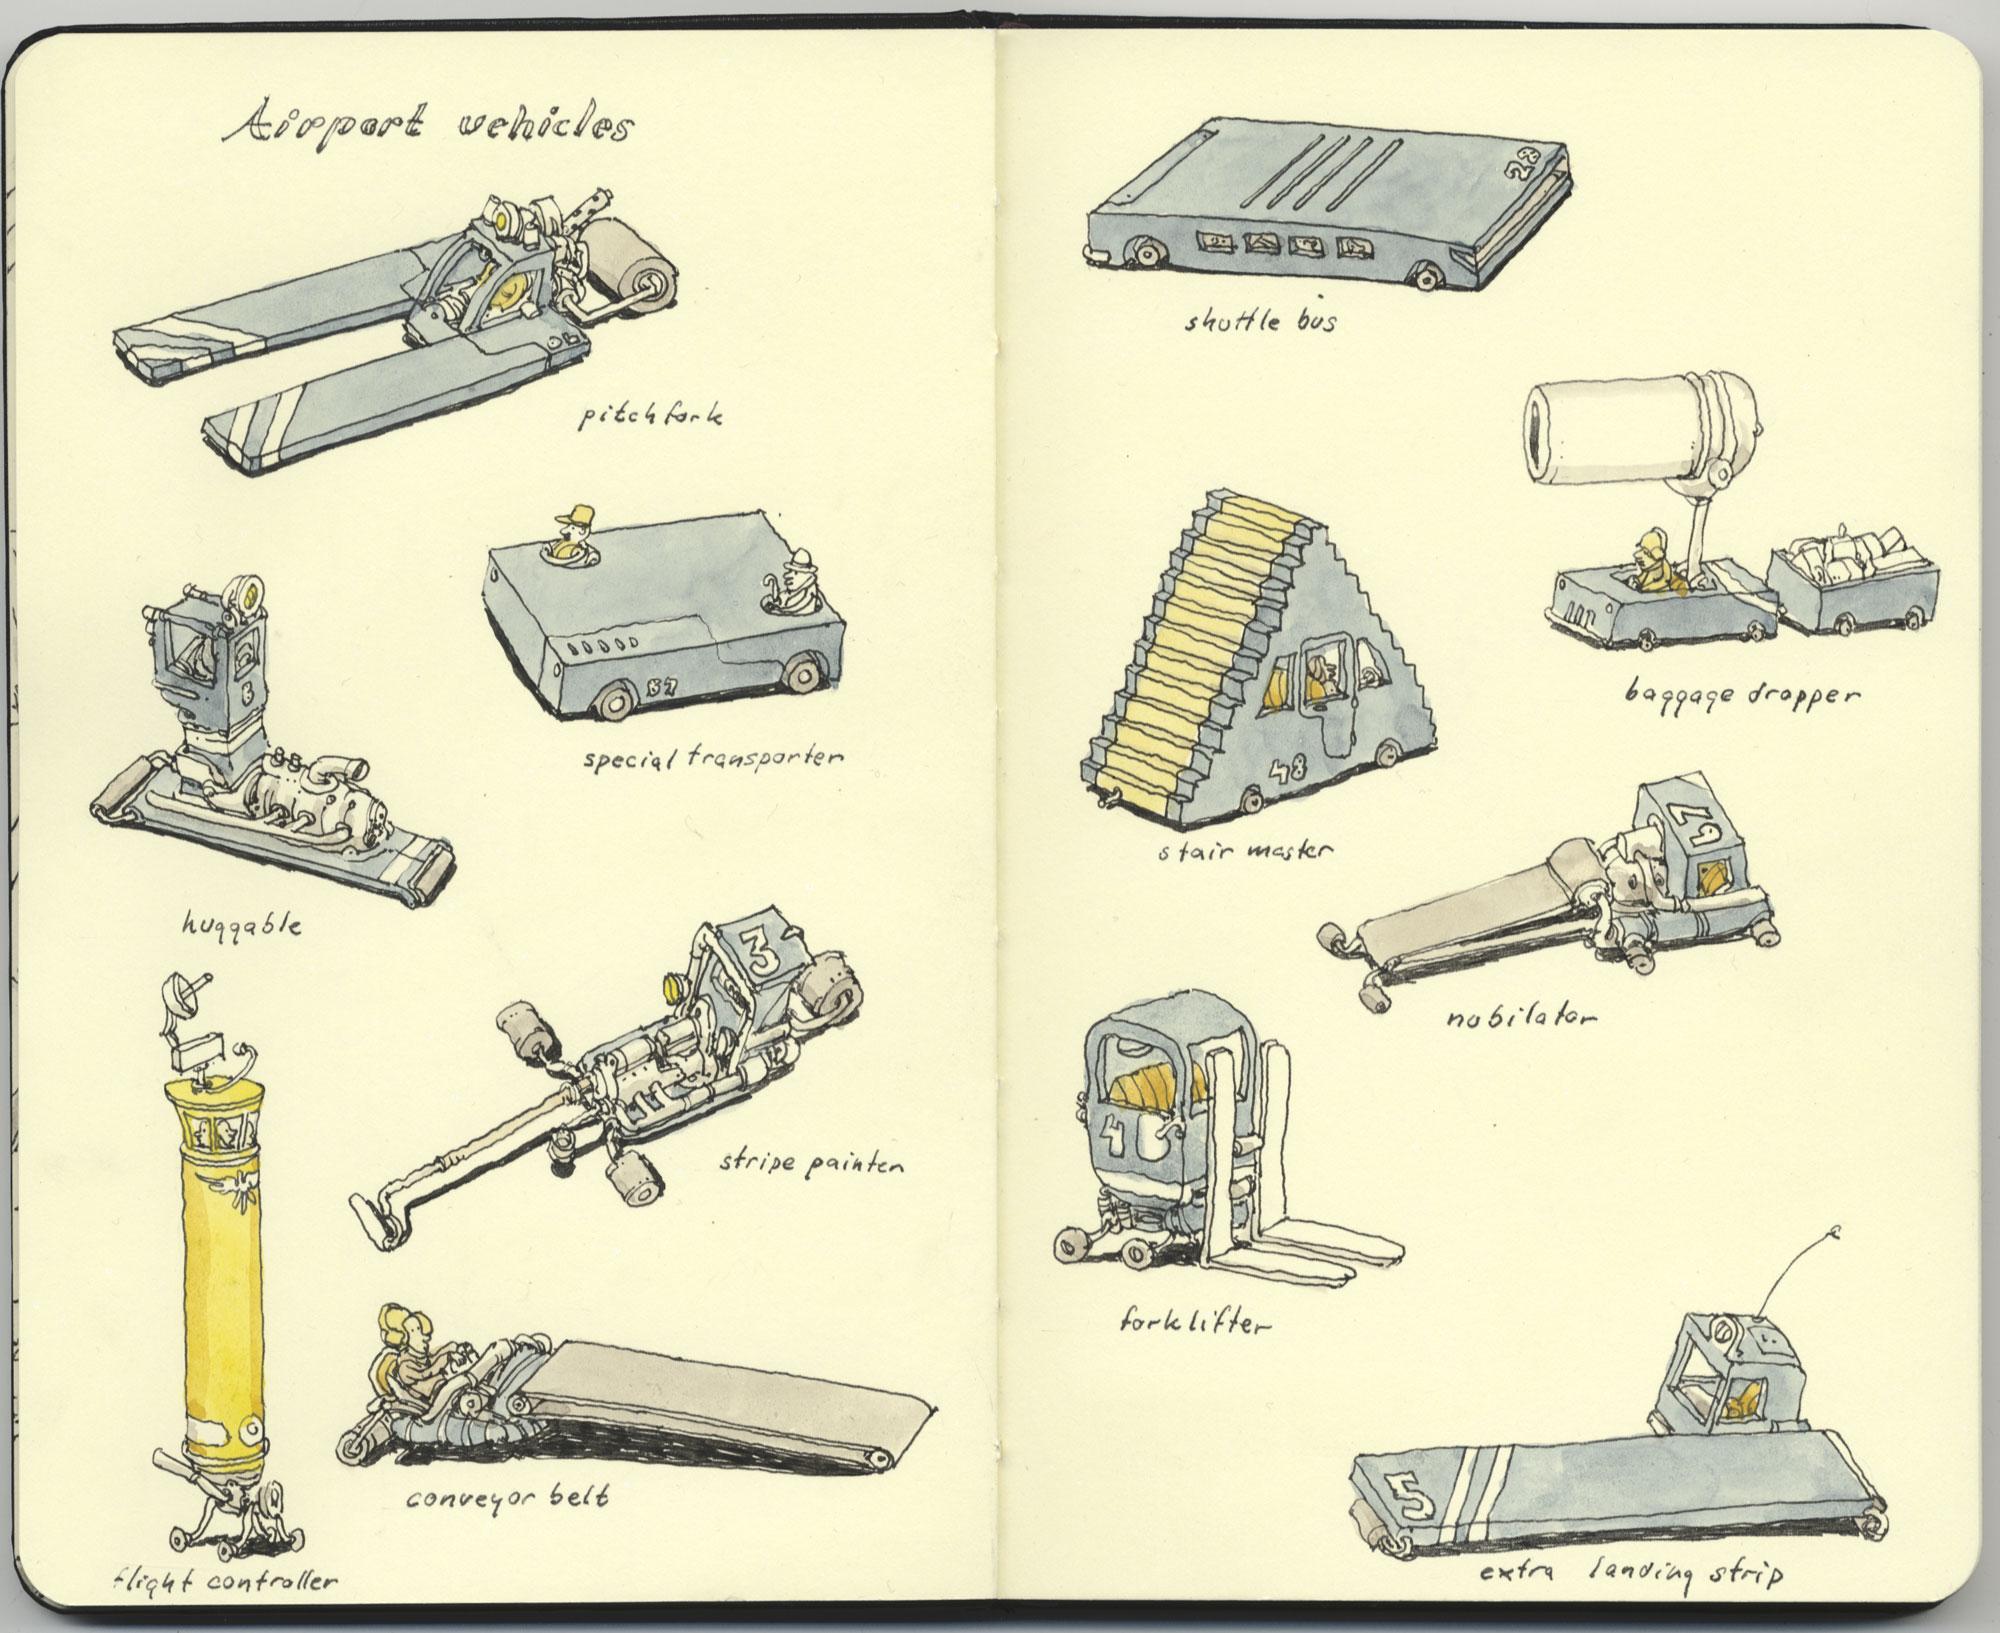 Airport-vehicles